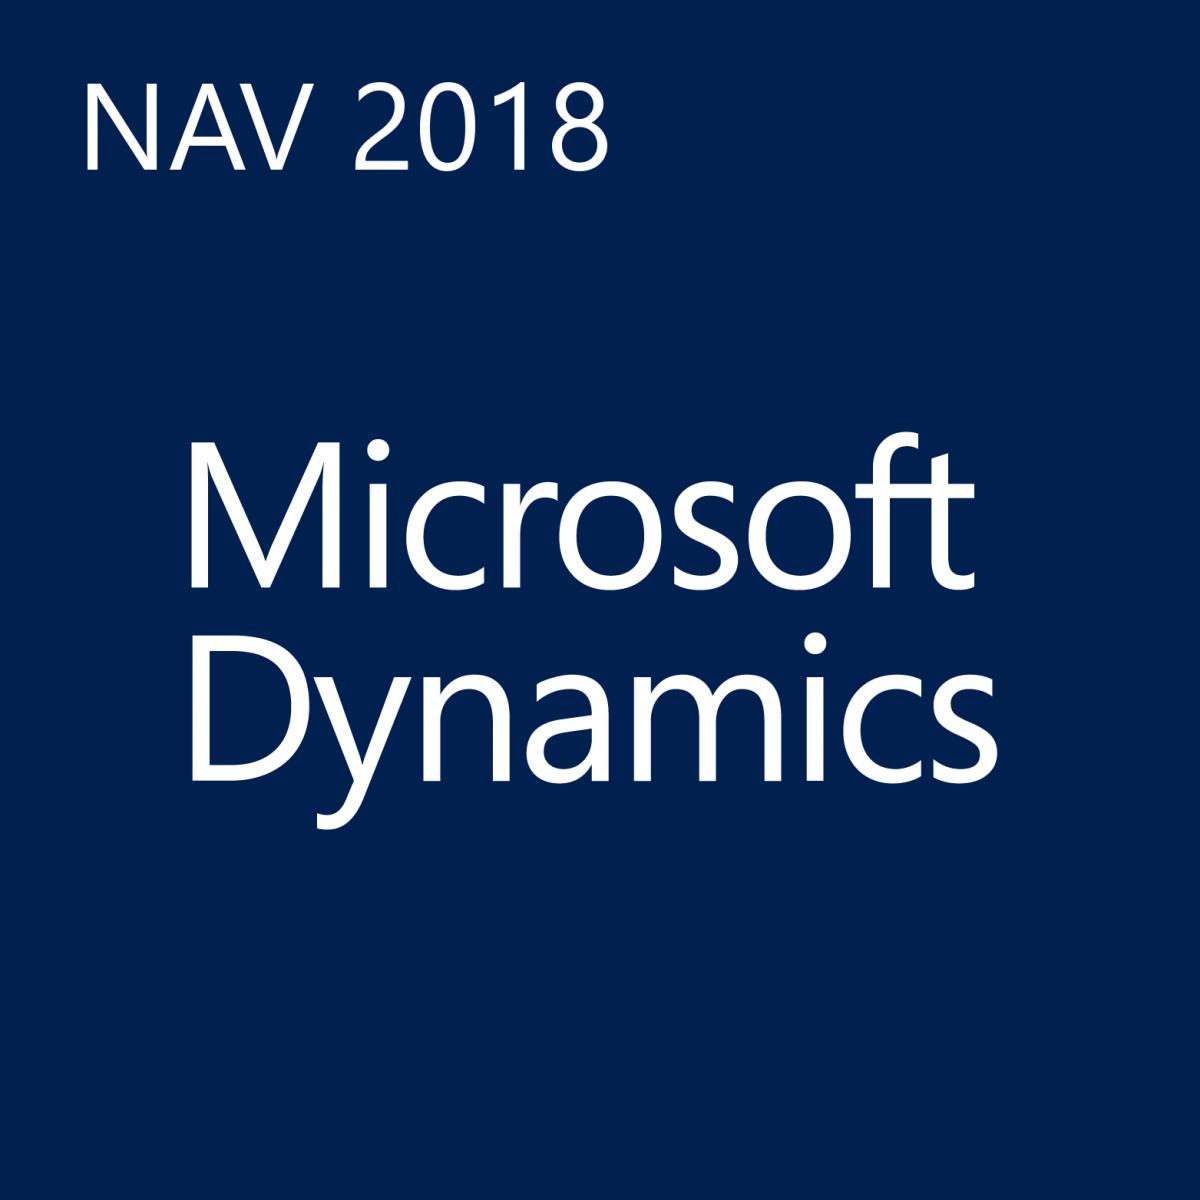 MS Dynamics NAV 2018